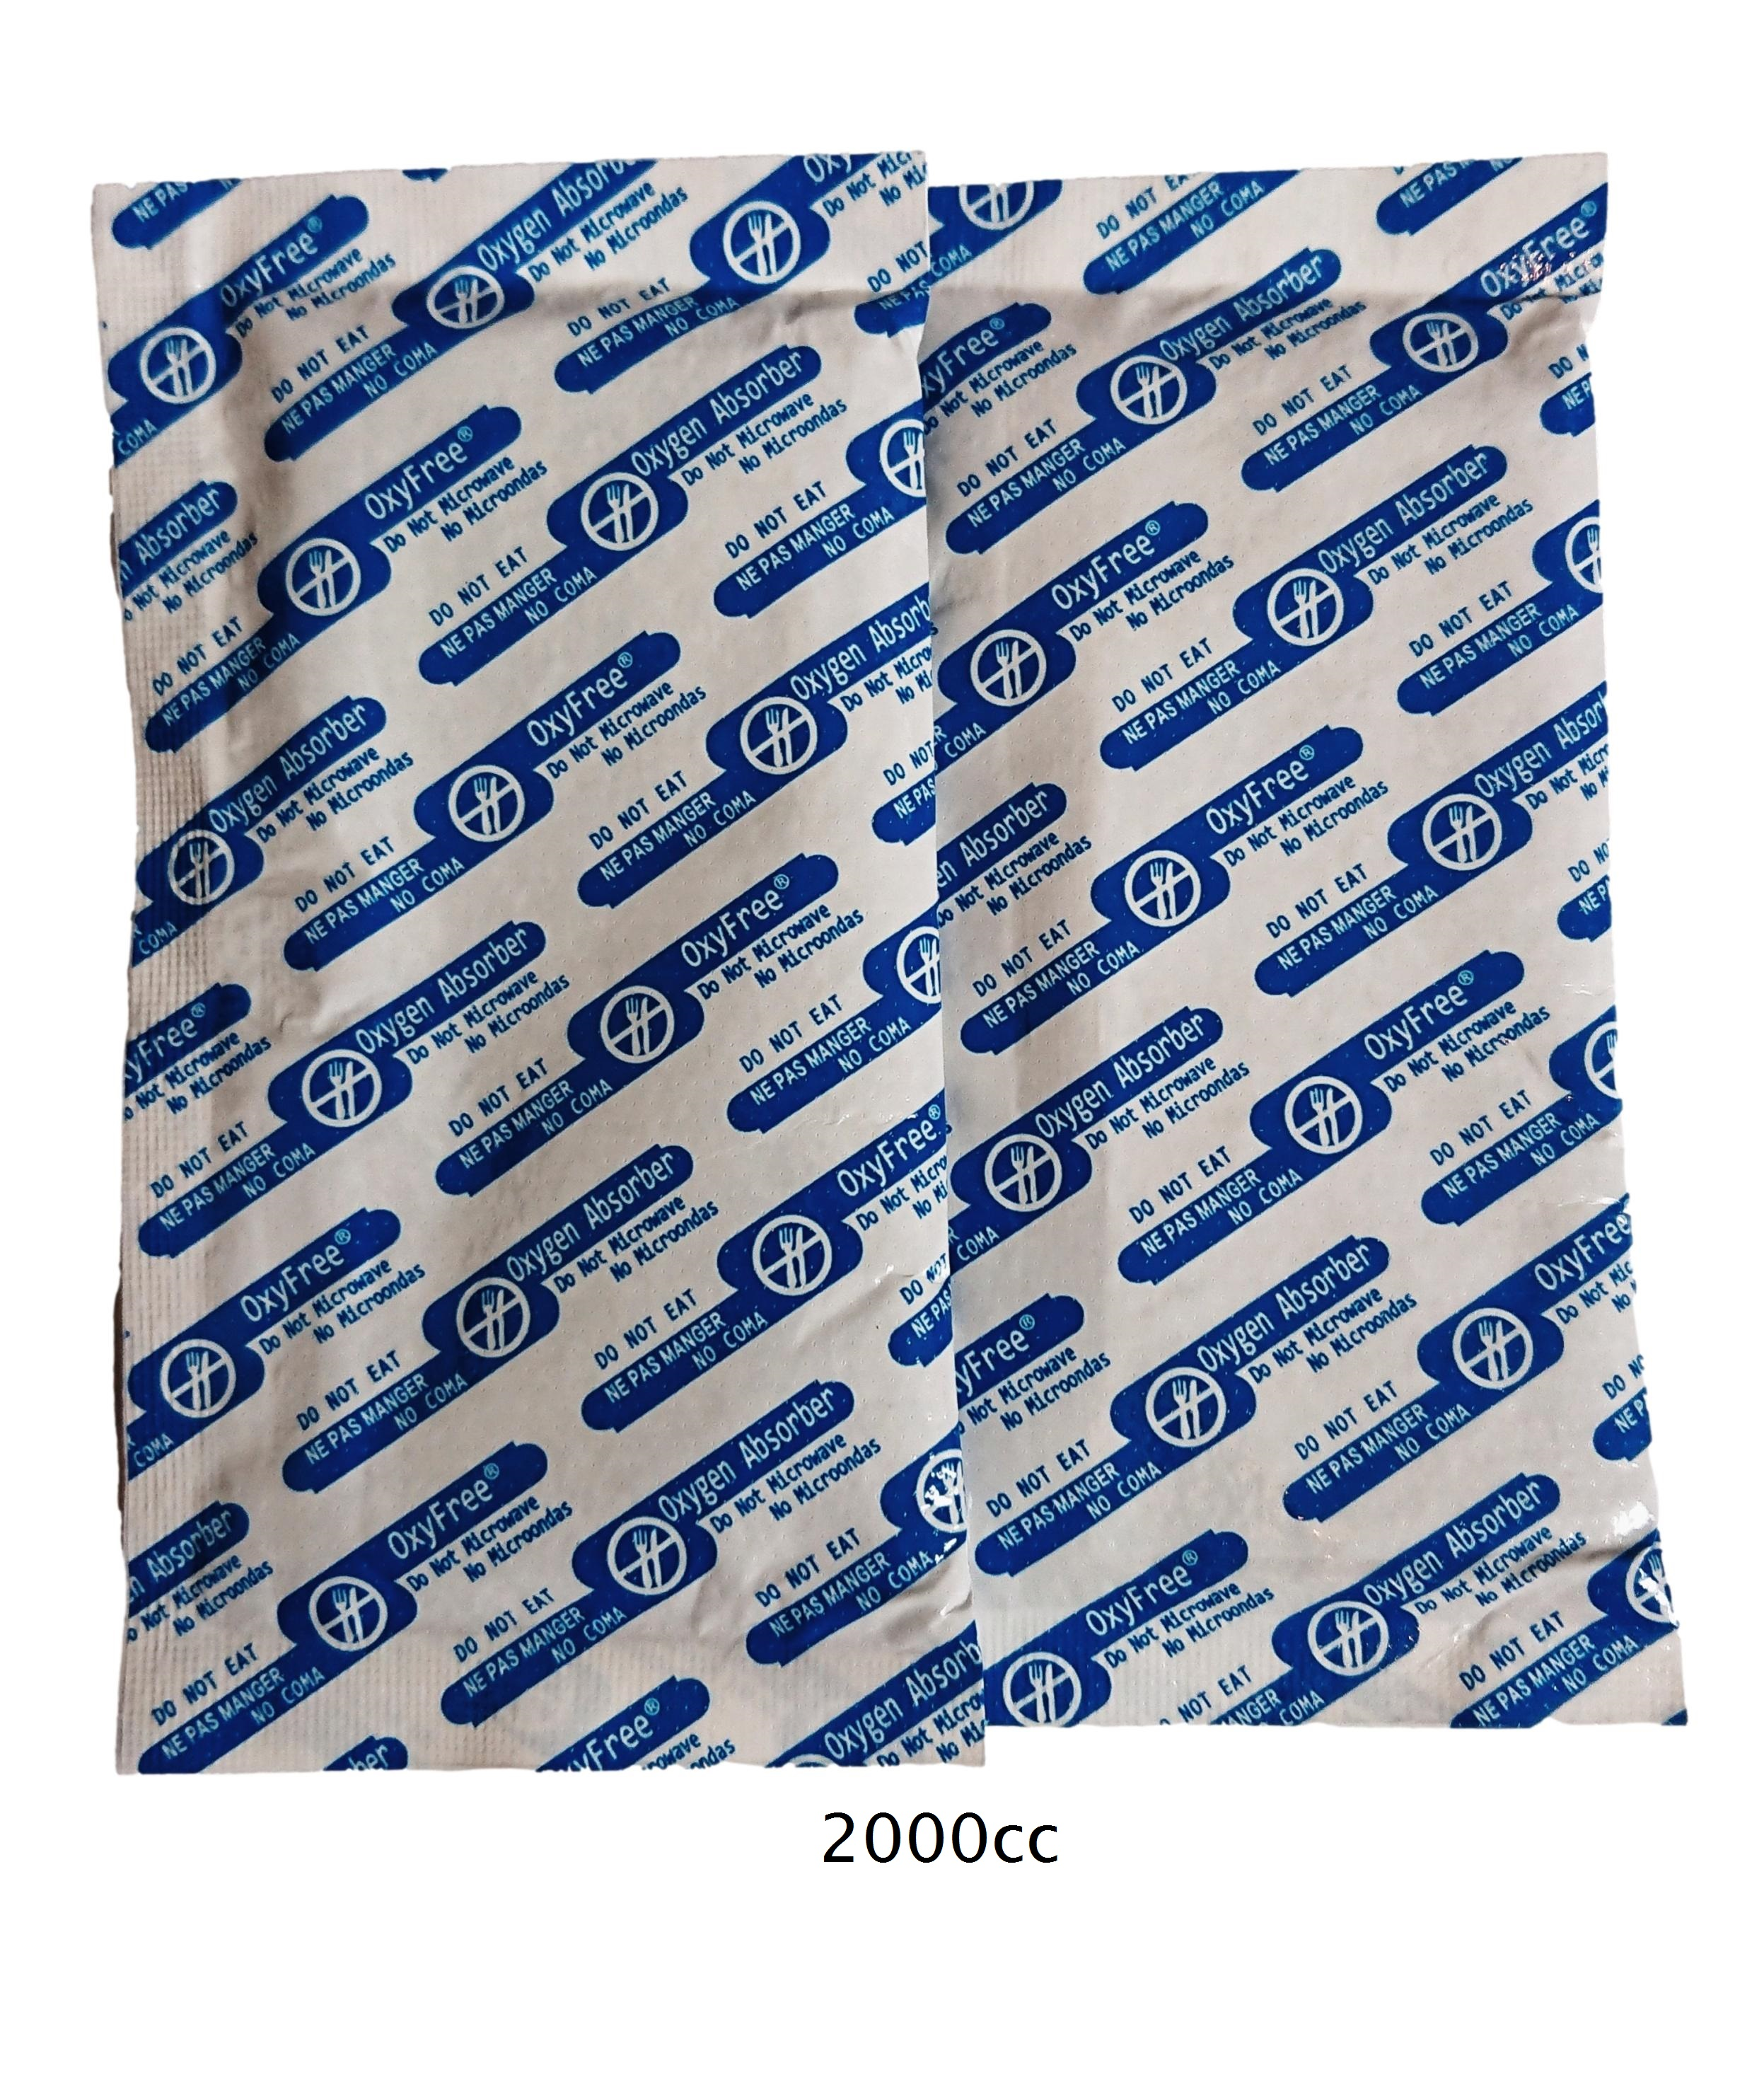 2,000cc absorbeurs d'oxygène